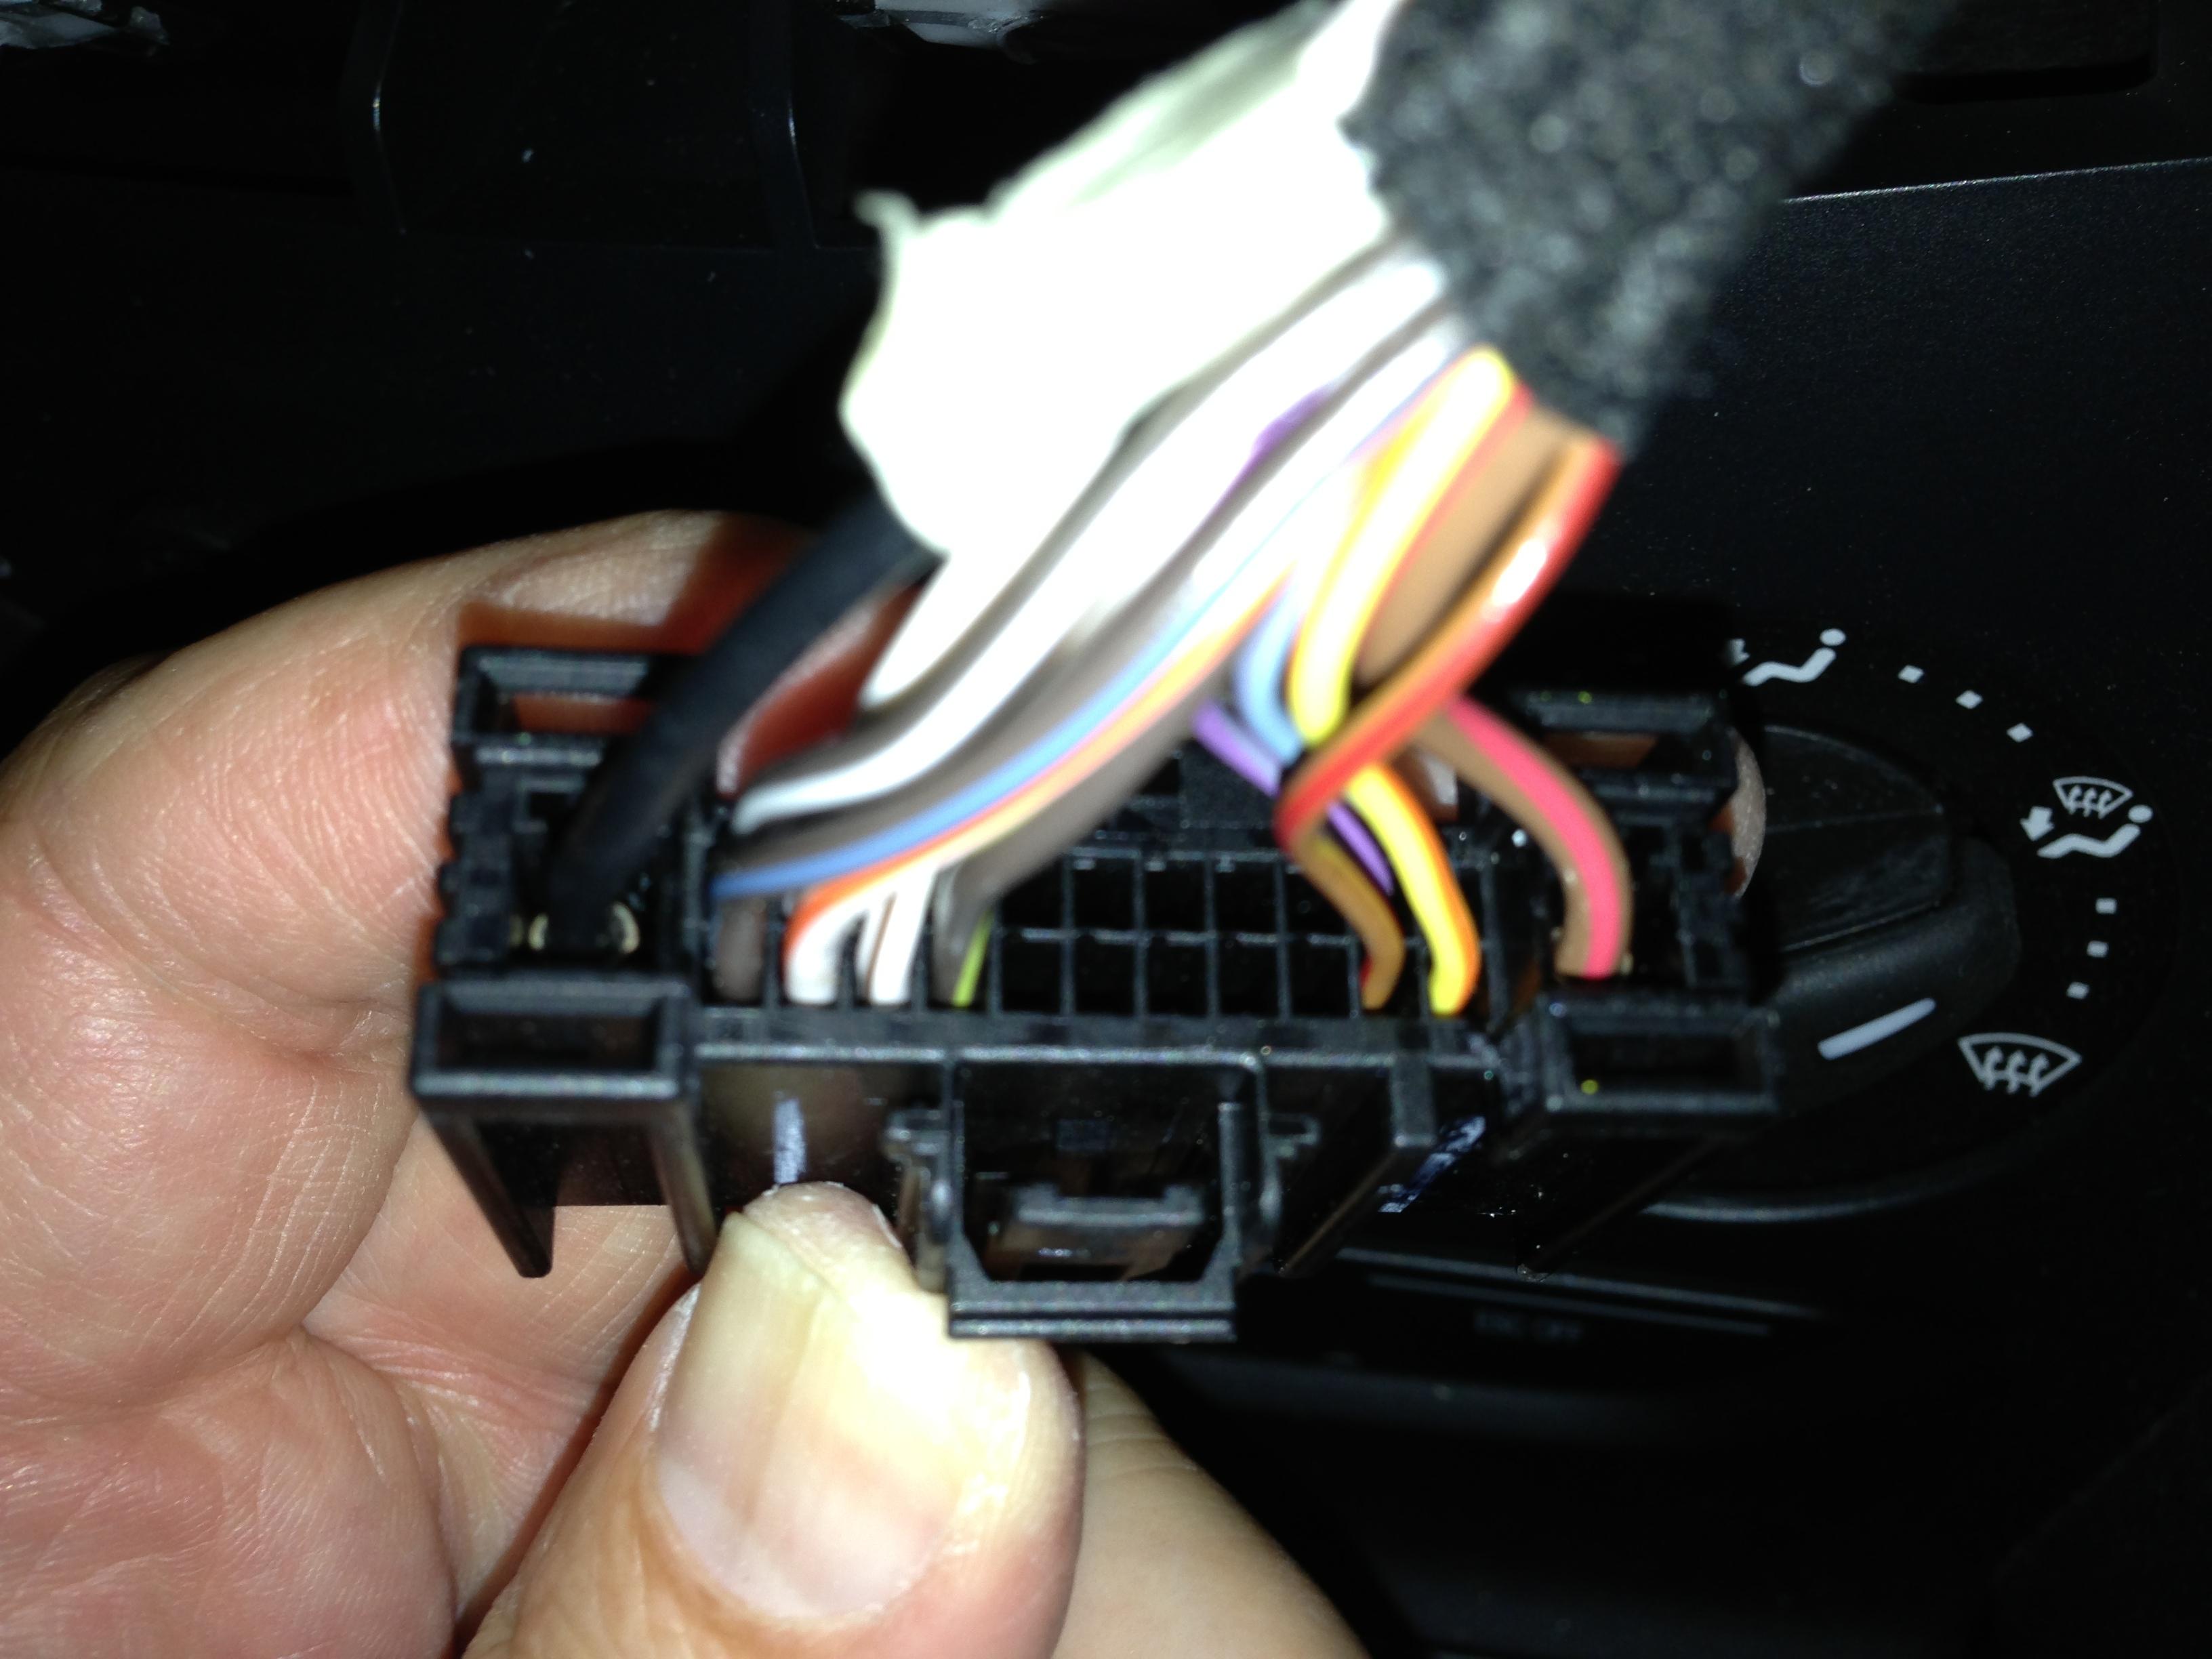 2011 Ford Fiesta Radio Wiring Diagram | Wiring Diagram - Ford Radio Wiring Diagram Download